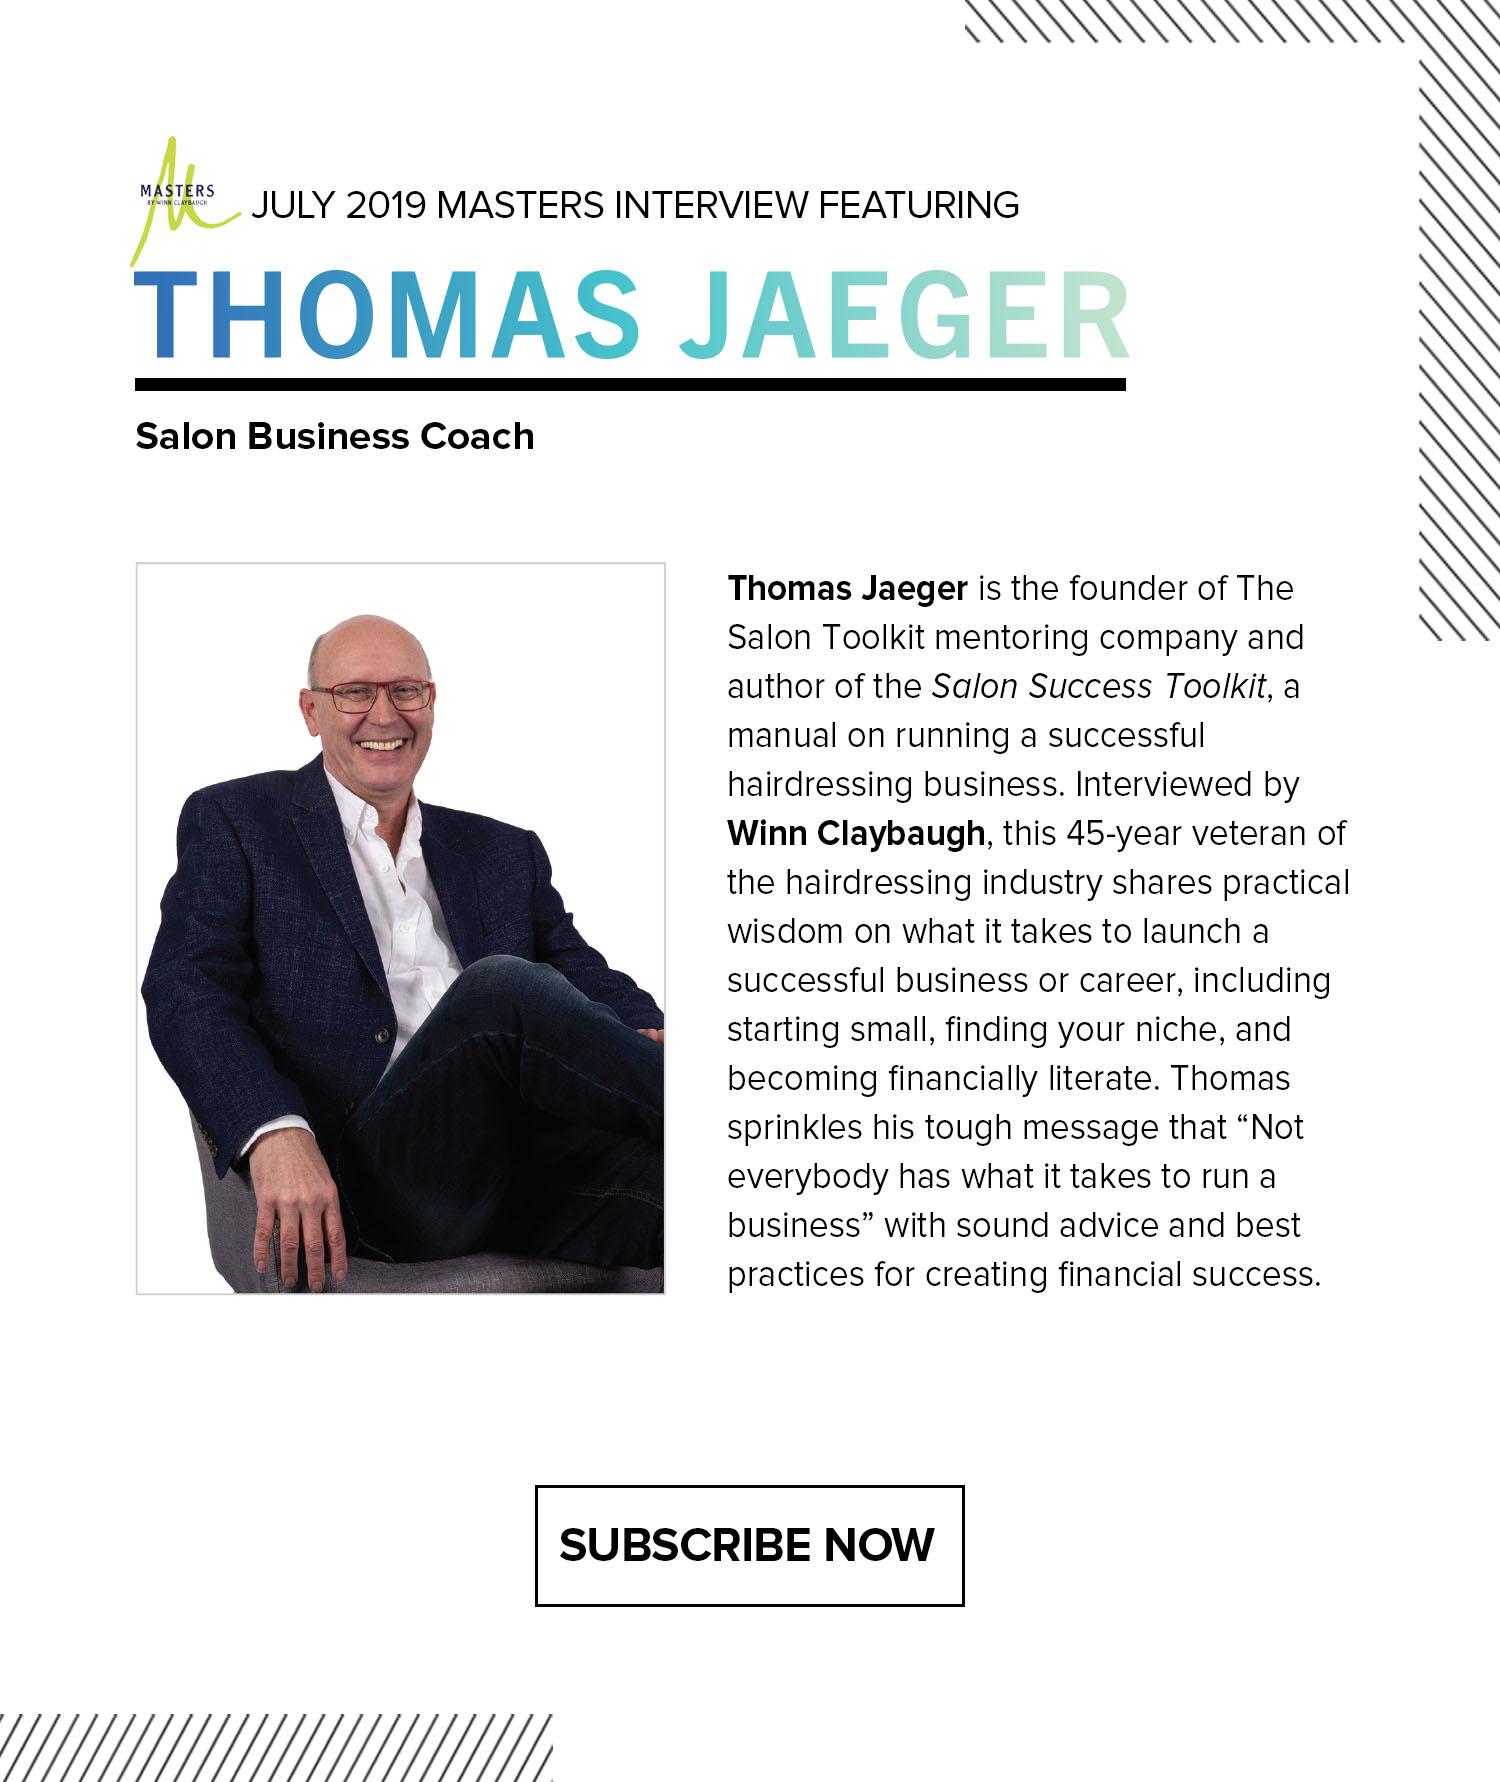 MASTERS Thomas Jaeger Subscribe_719.jpg